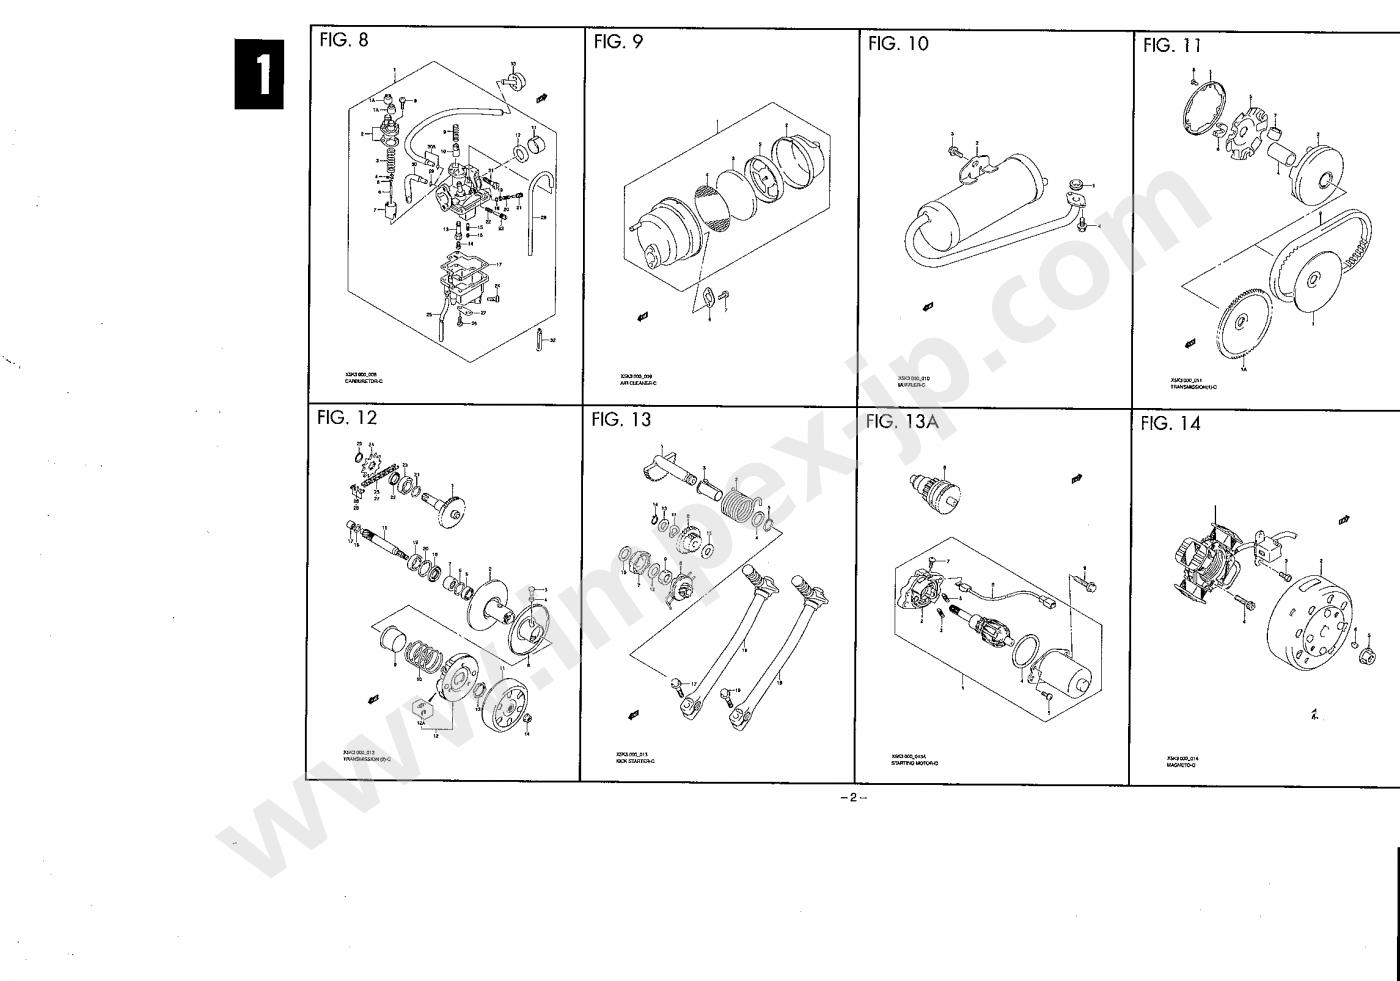 Motorcycle Parts Suzuki Choi Nori X5 Cz41a Impex Japan Engine Diagram